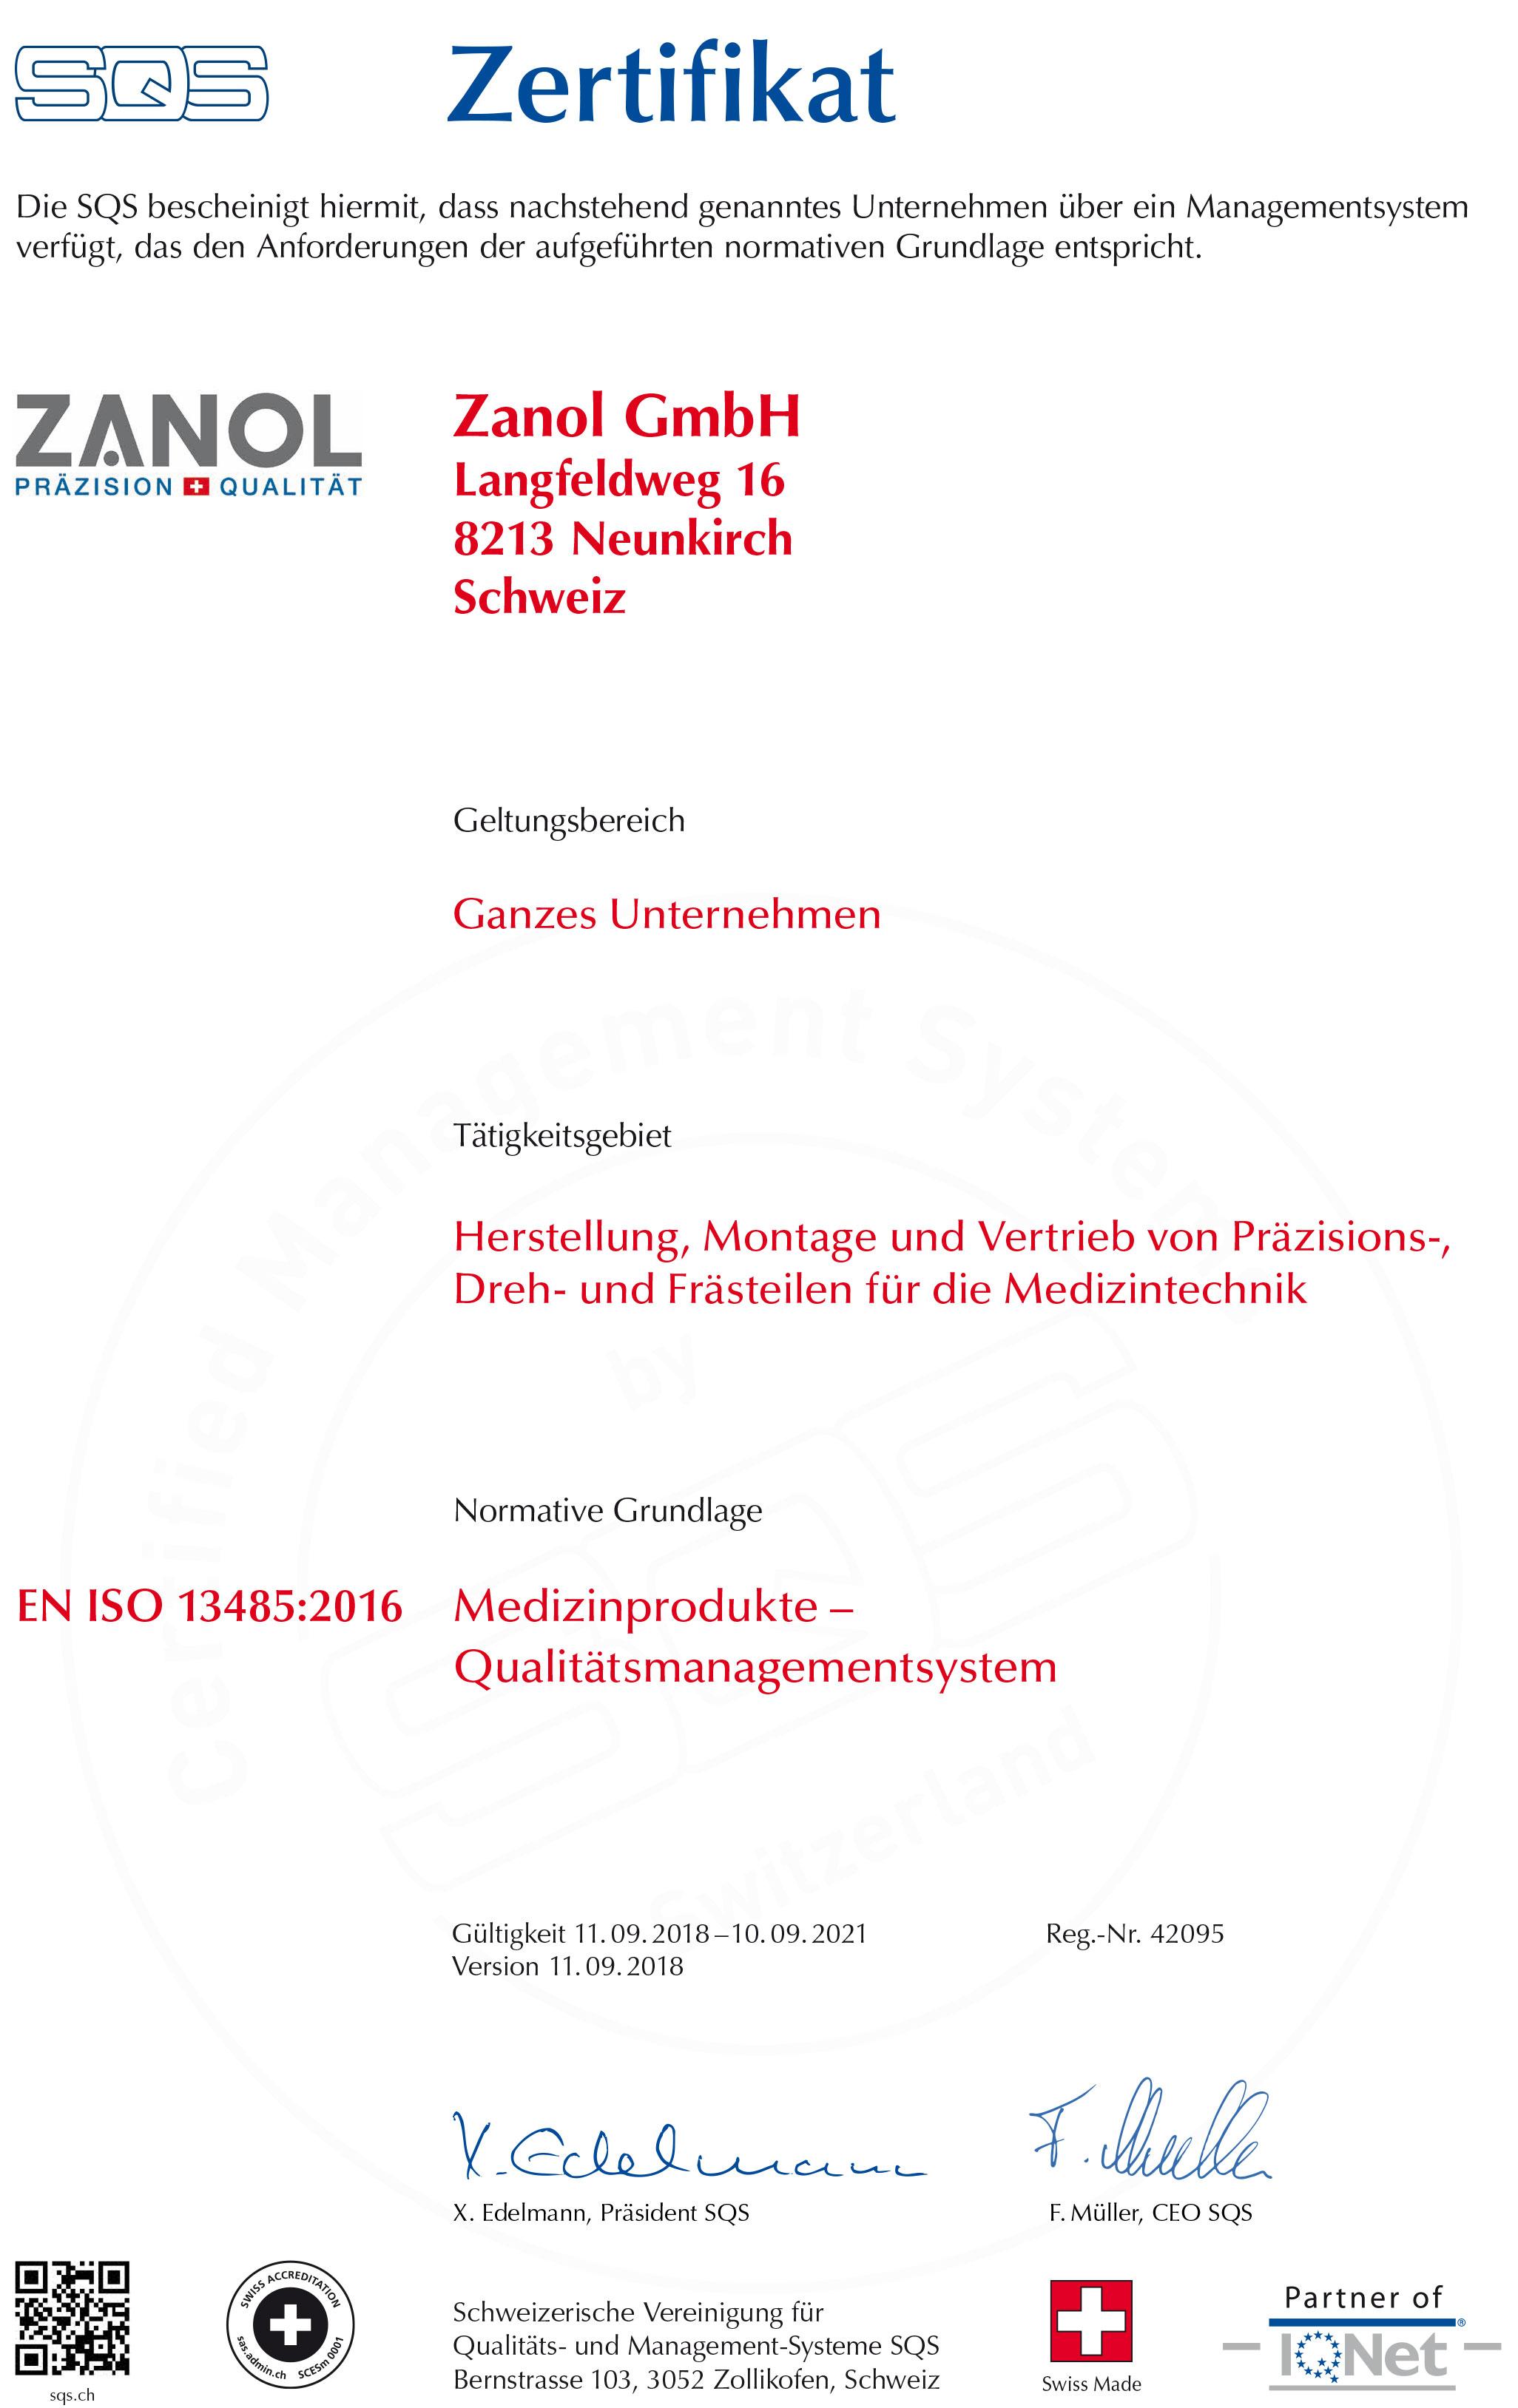 ZANOL Zertifikat